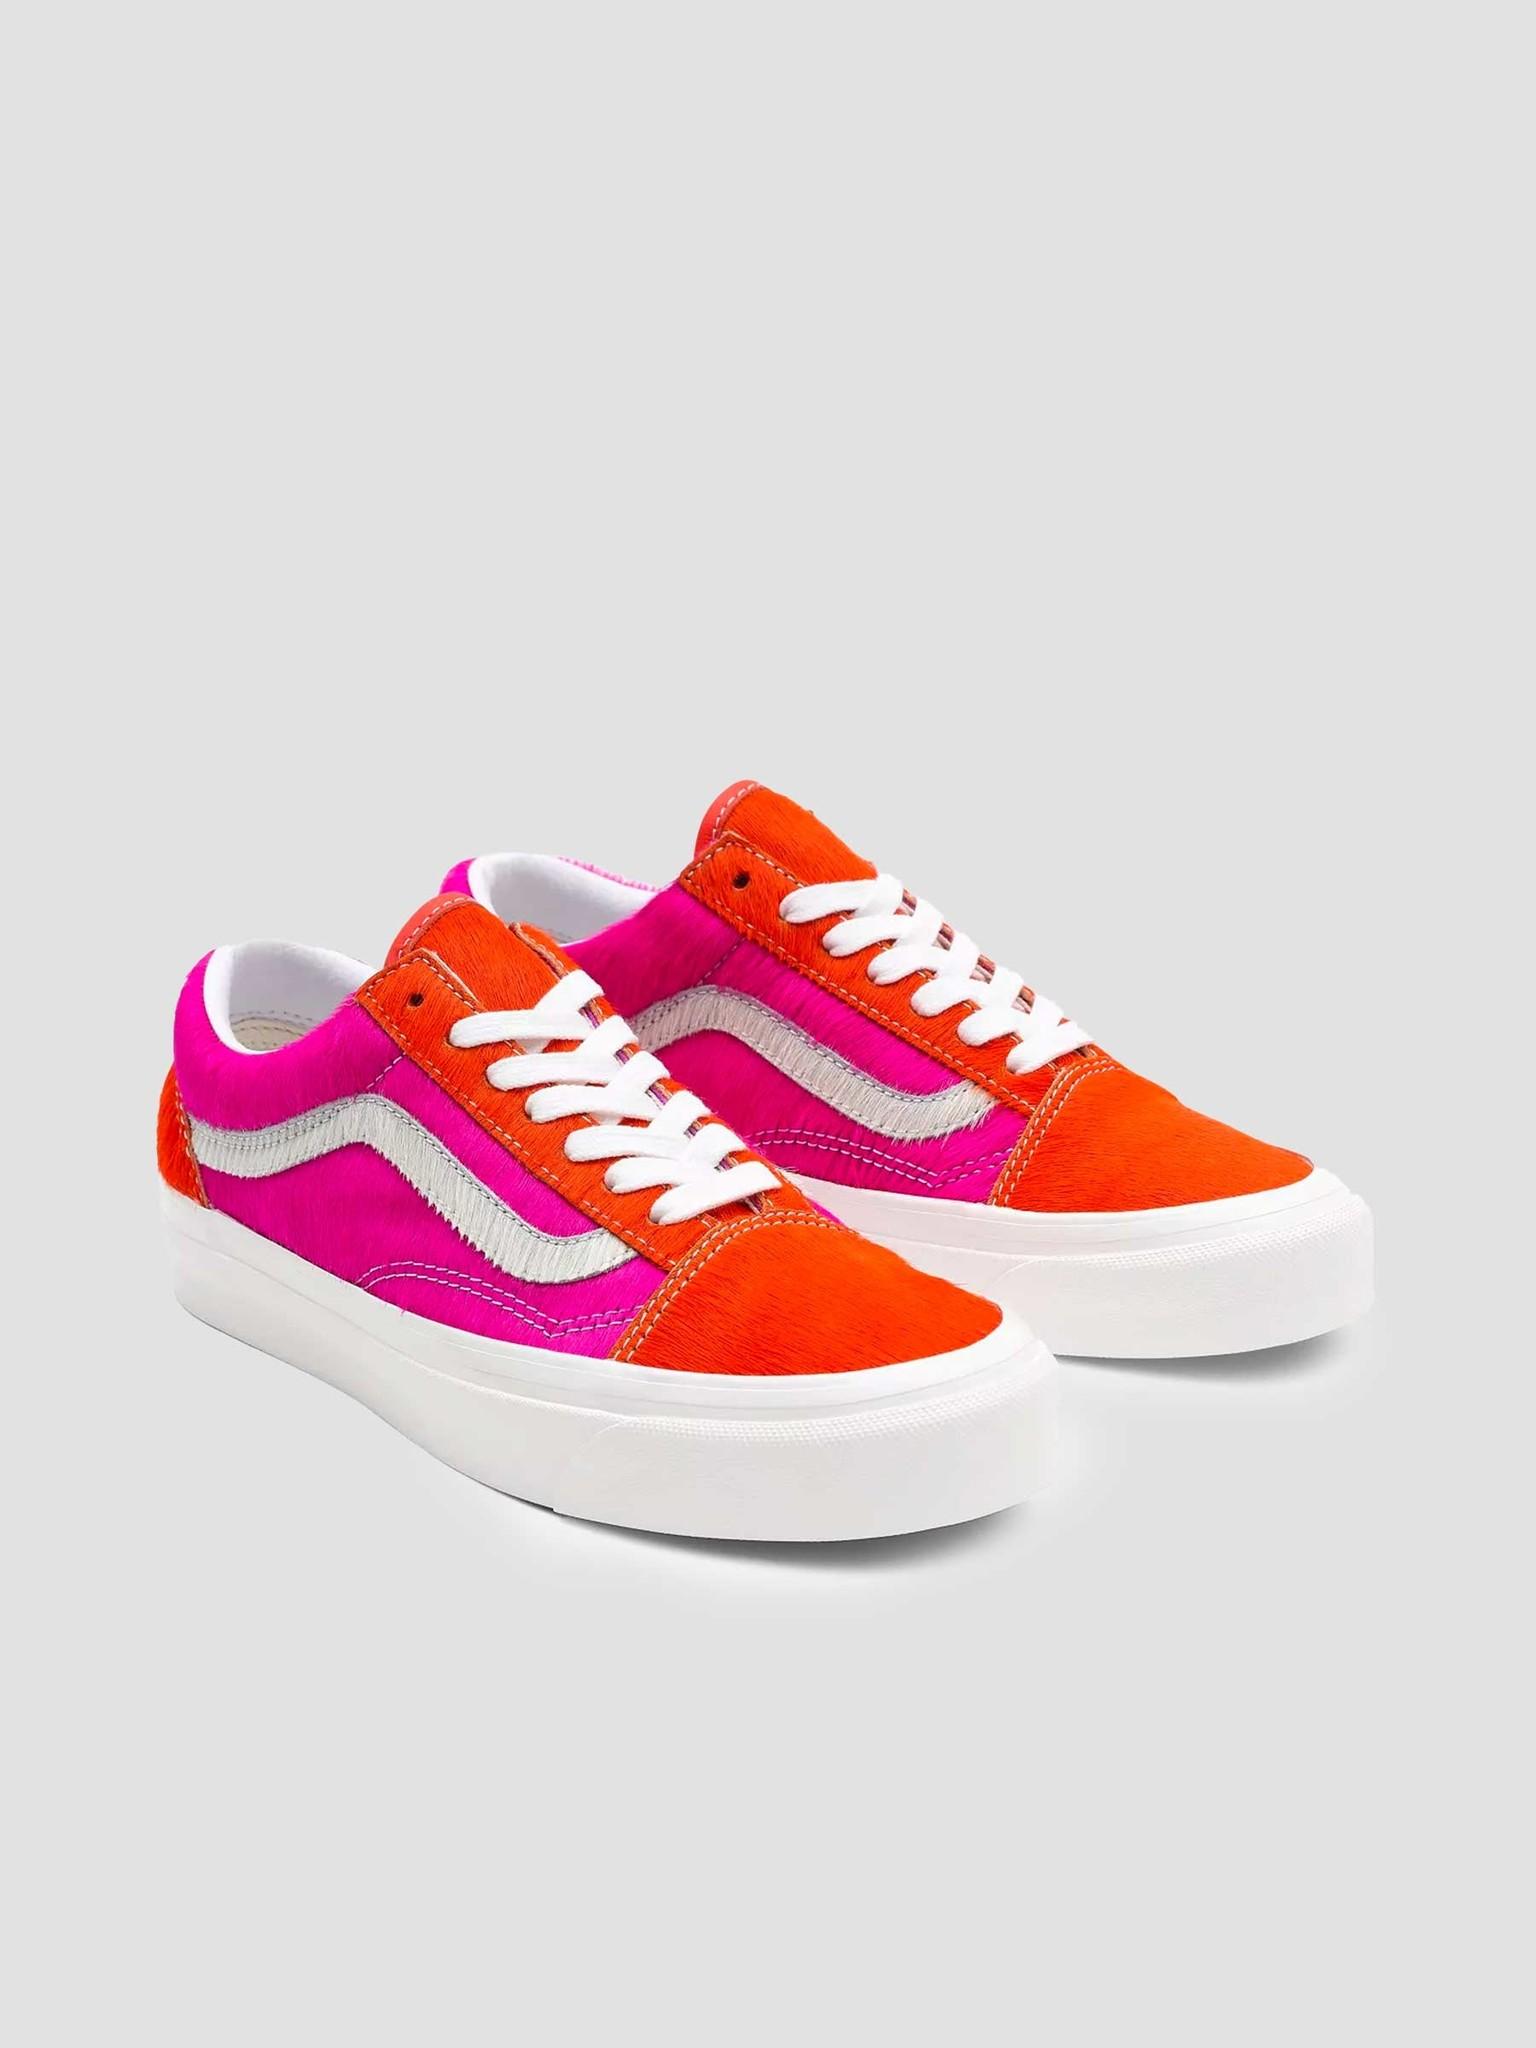 Vans Vans UA Old Skool 36 DX (Anaheim Factory) Pink Pony True White VN0A54F341R1